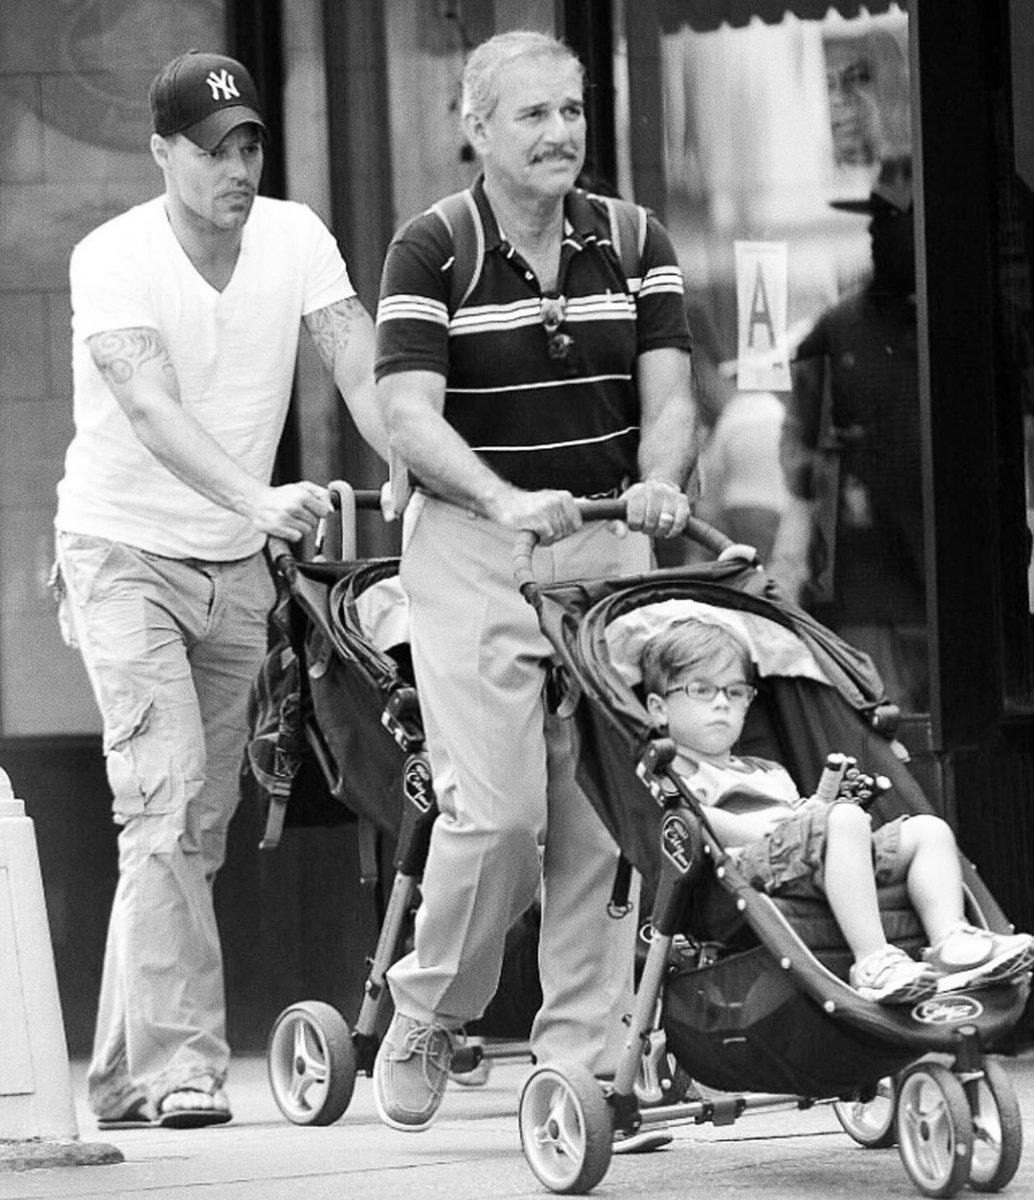 Replying to @ricky_martin: El mejor papá del mundo. Don Enrique Martin Negroni. ¡Te amo papá!